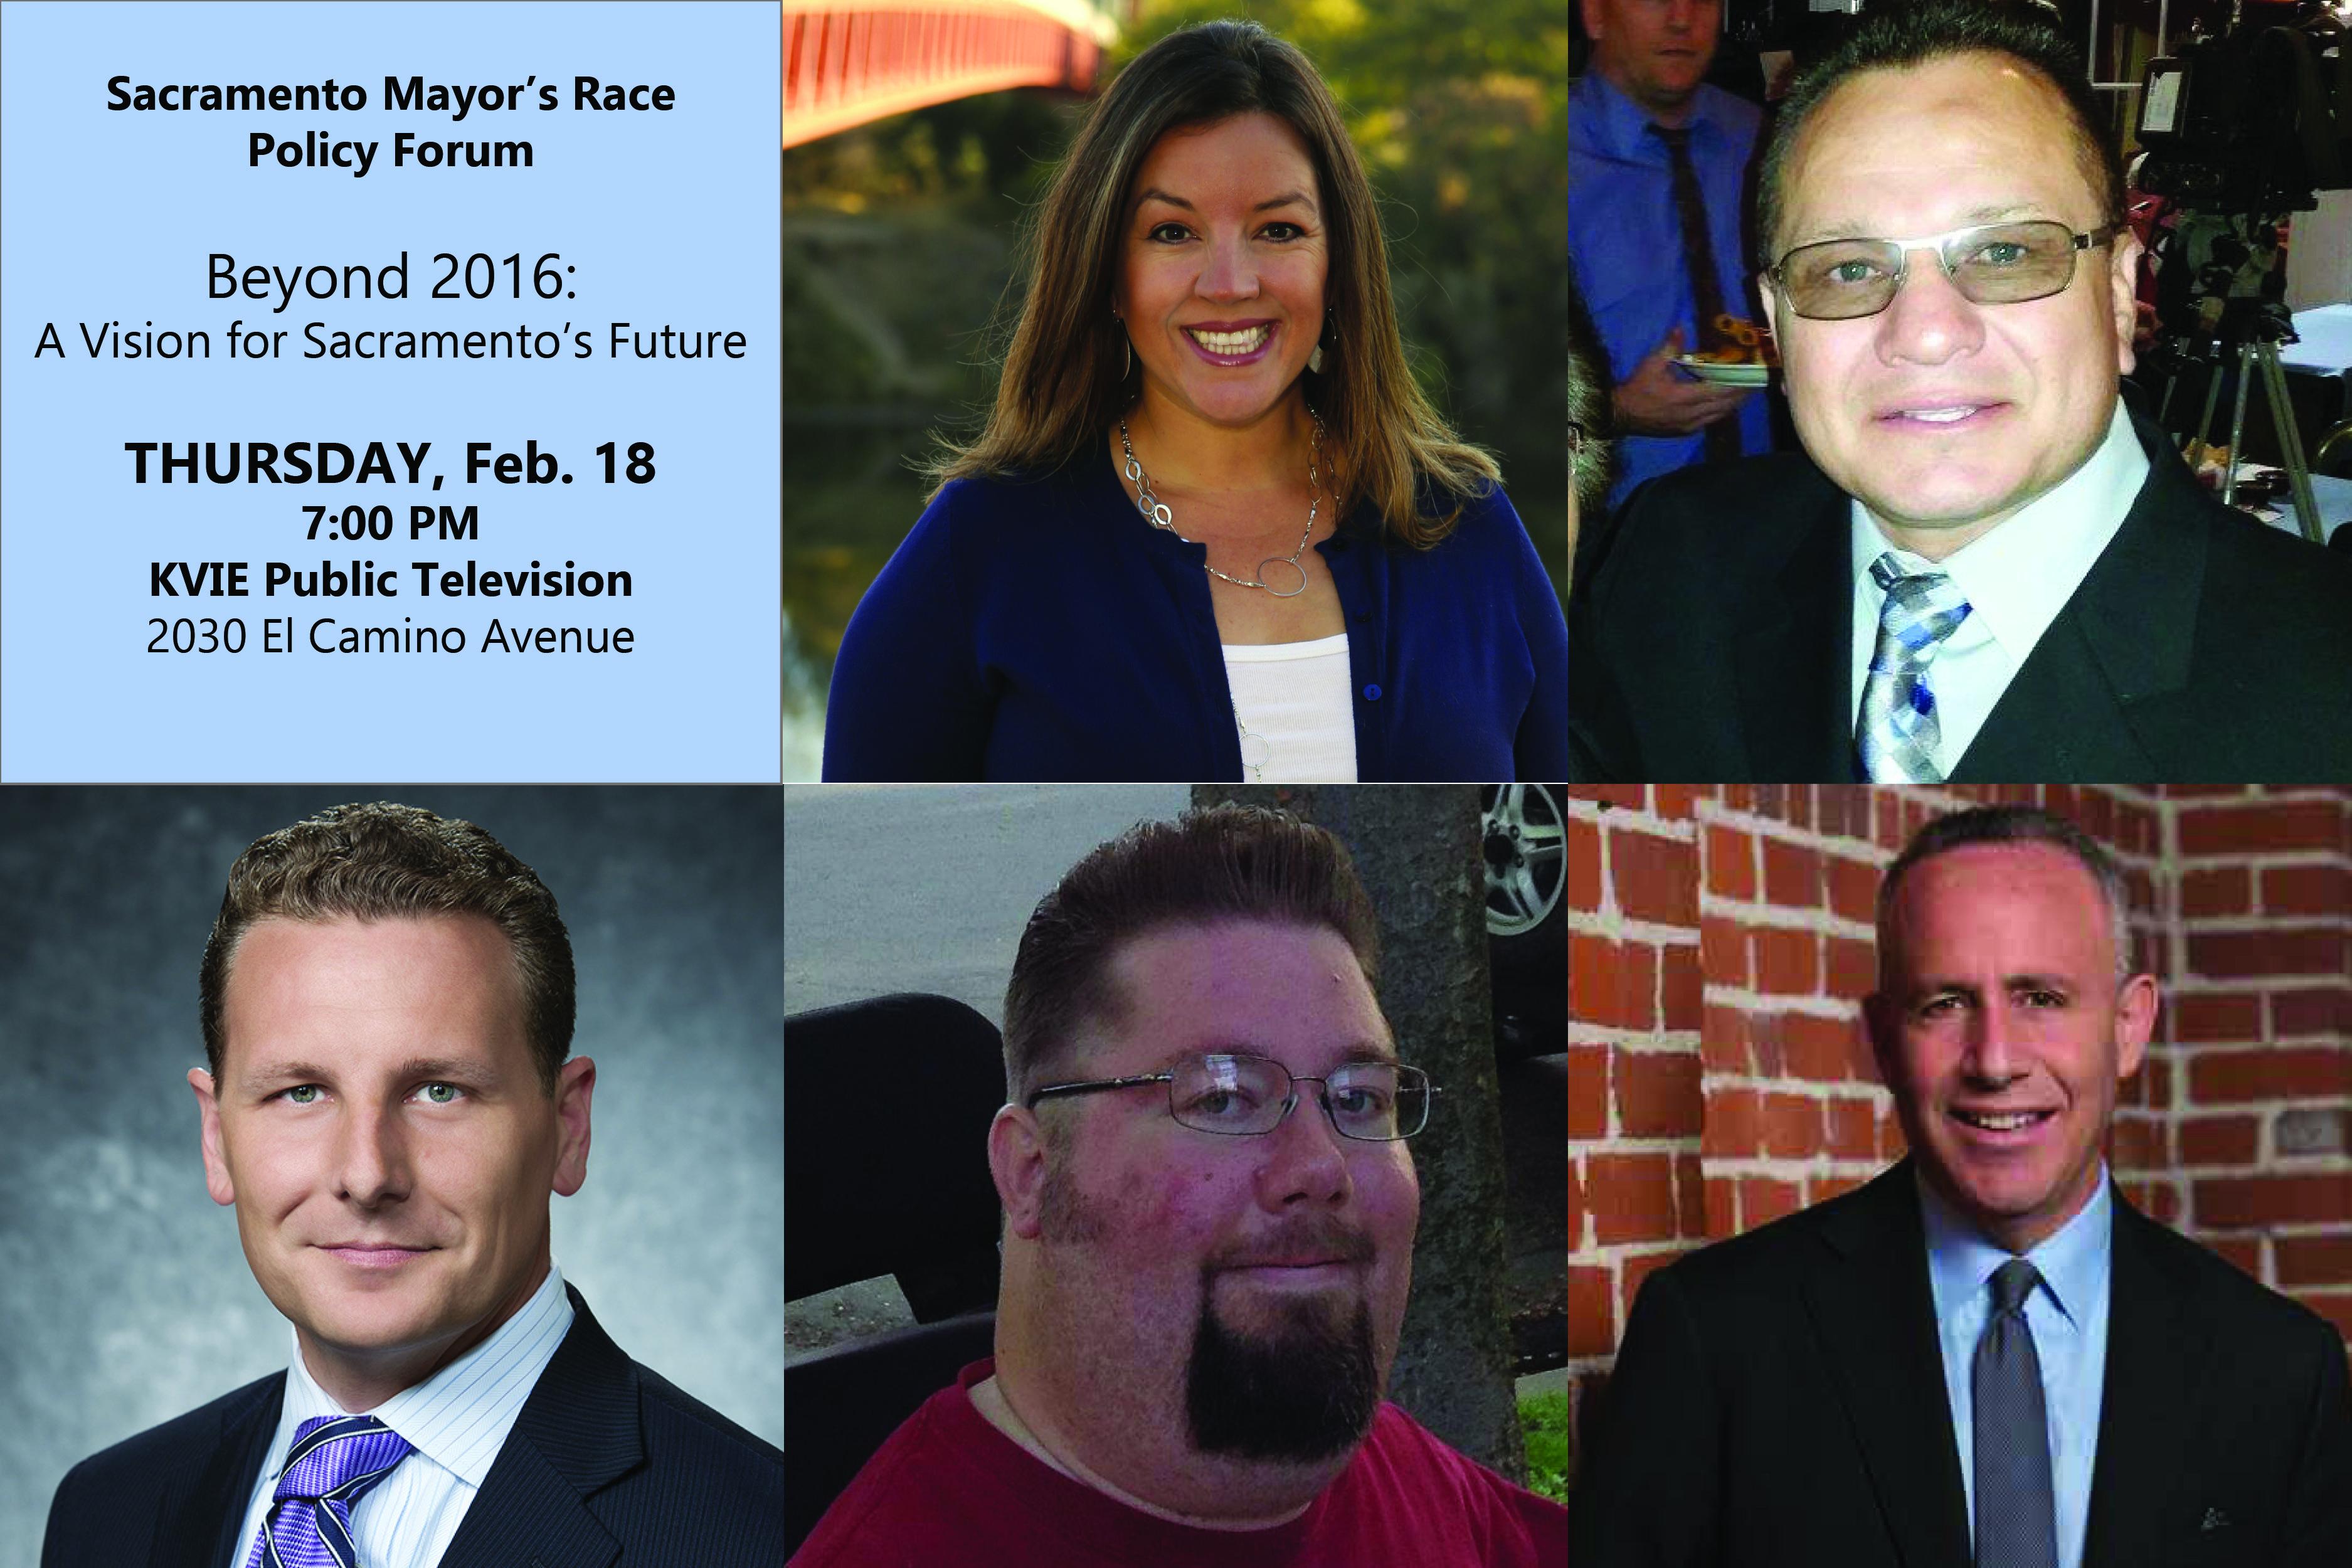 Sacramento-Mayor-Race-Policy-Forum-Feb.18